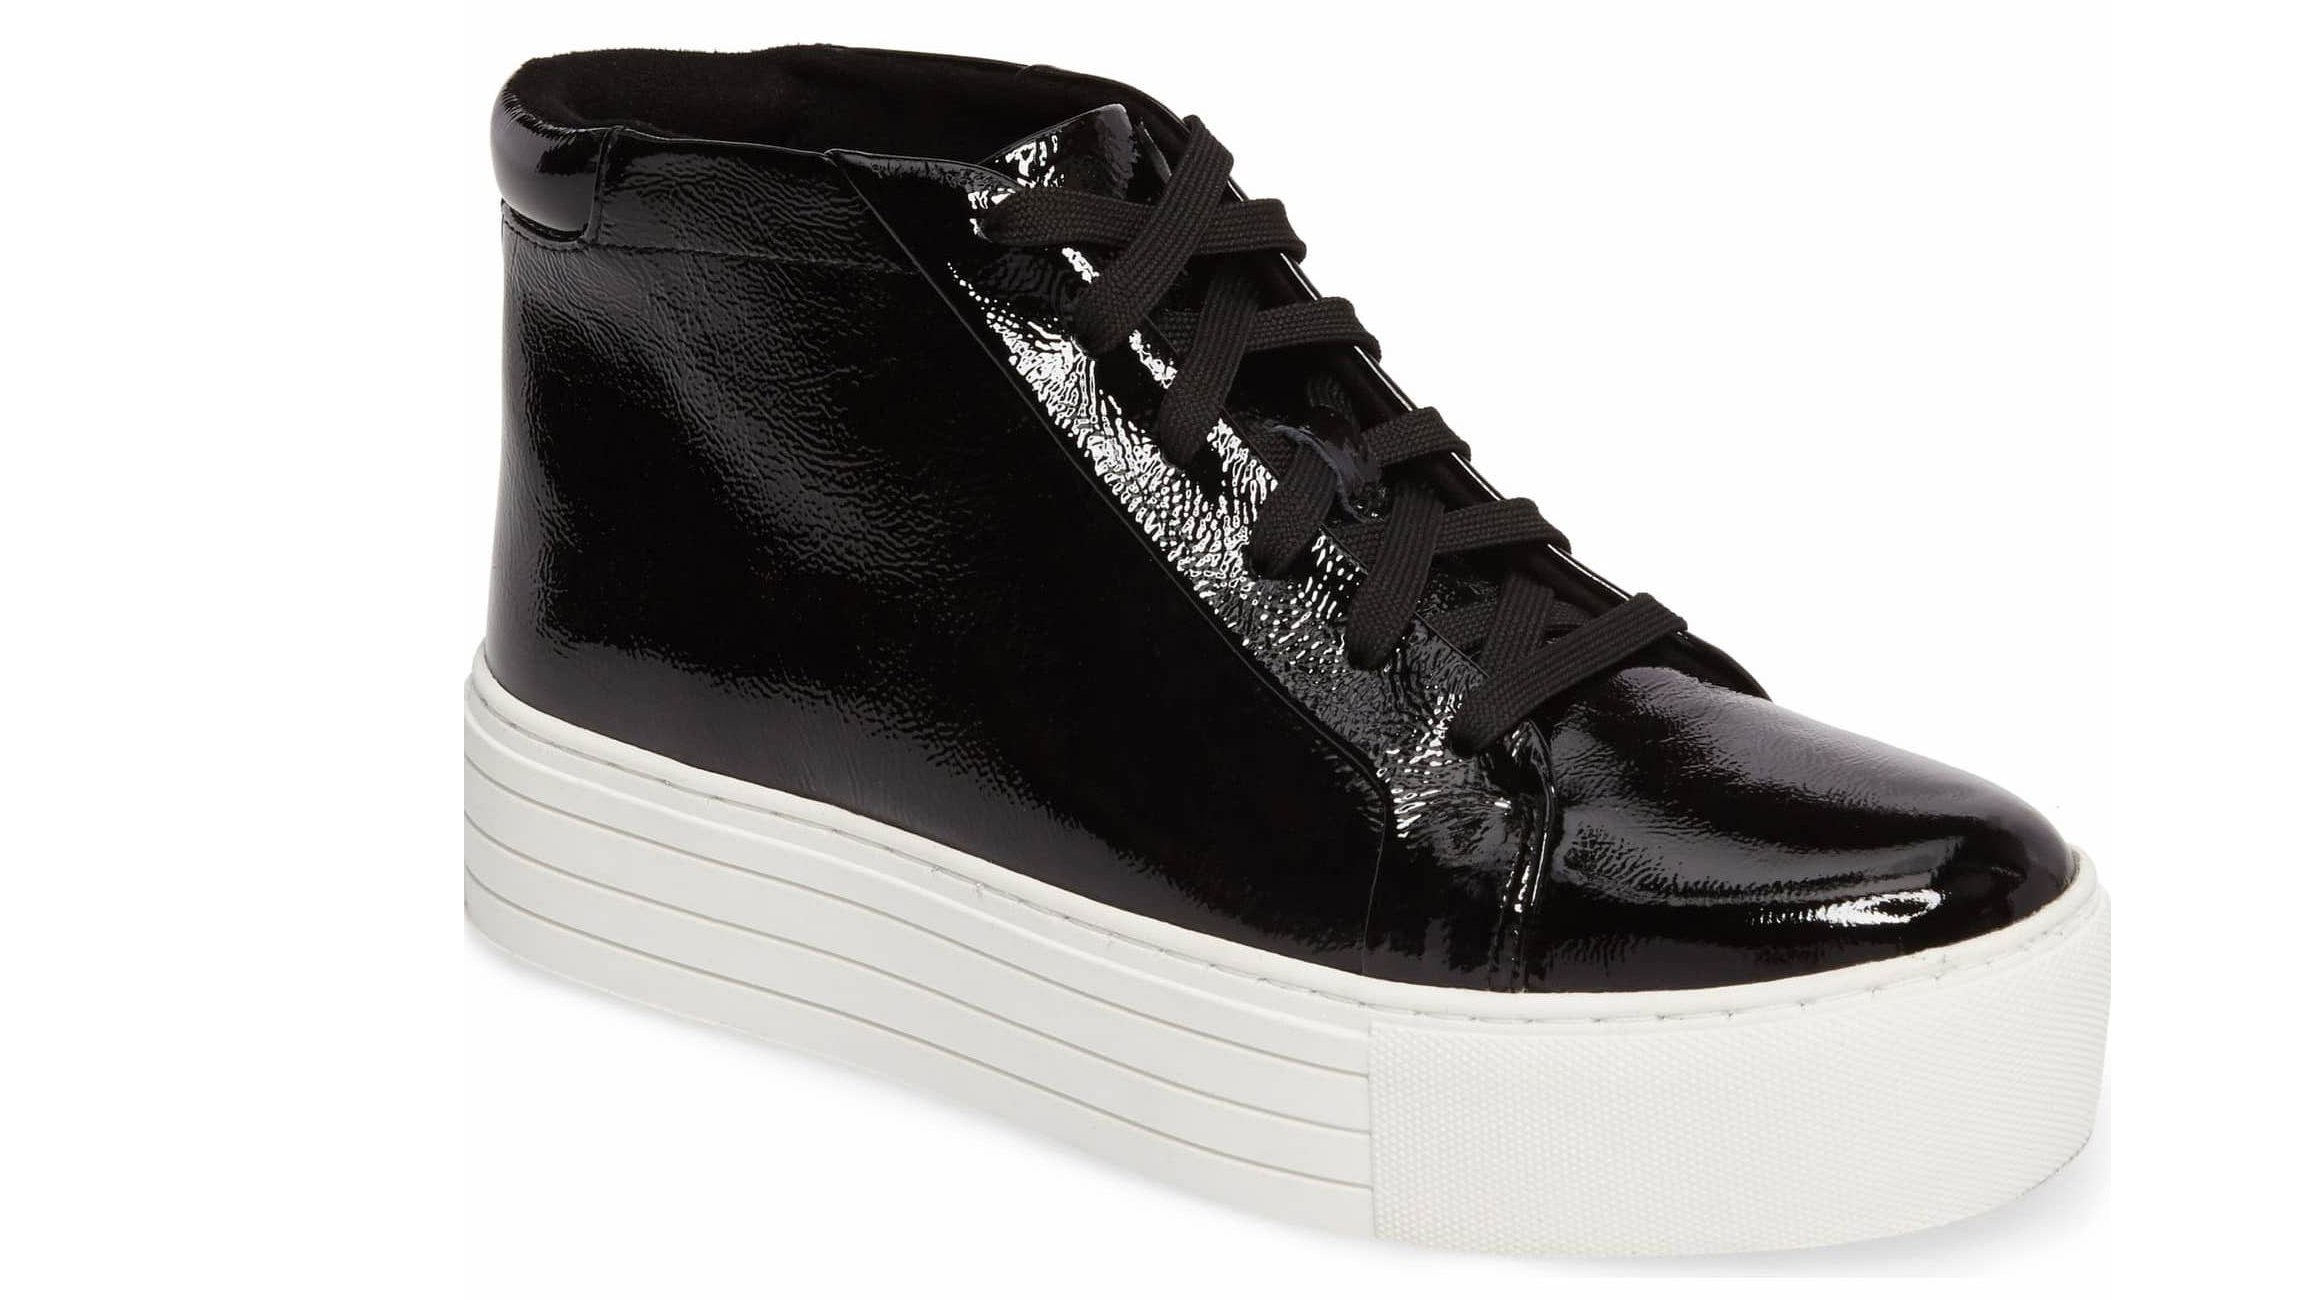 Kenneth-Cole-New-York-Janette-High-Top-Platform-Sneaker